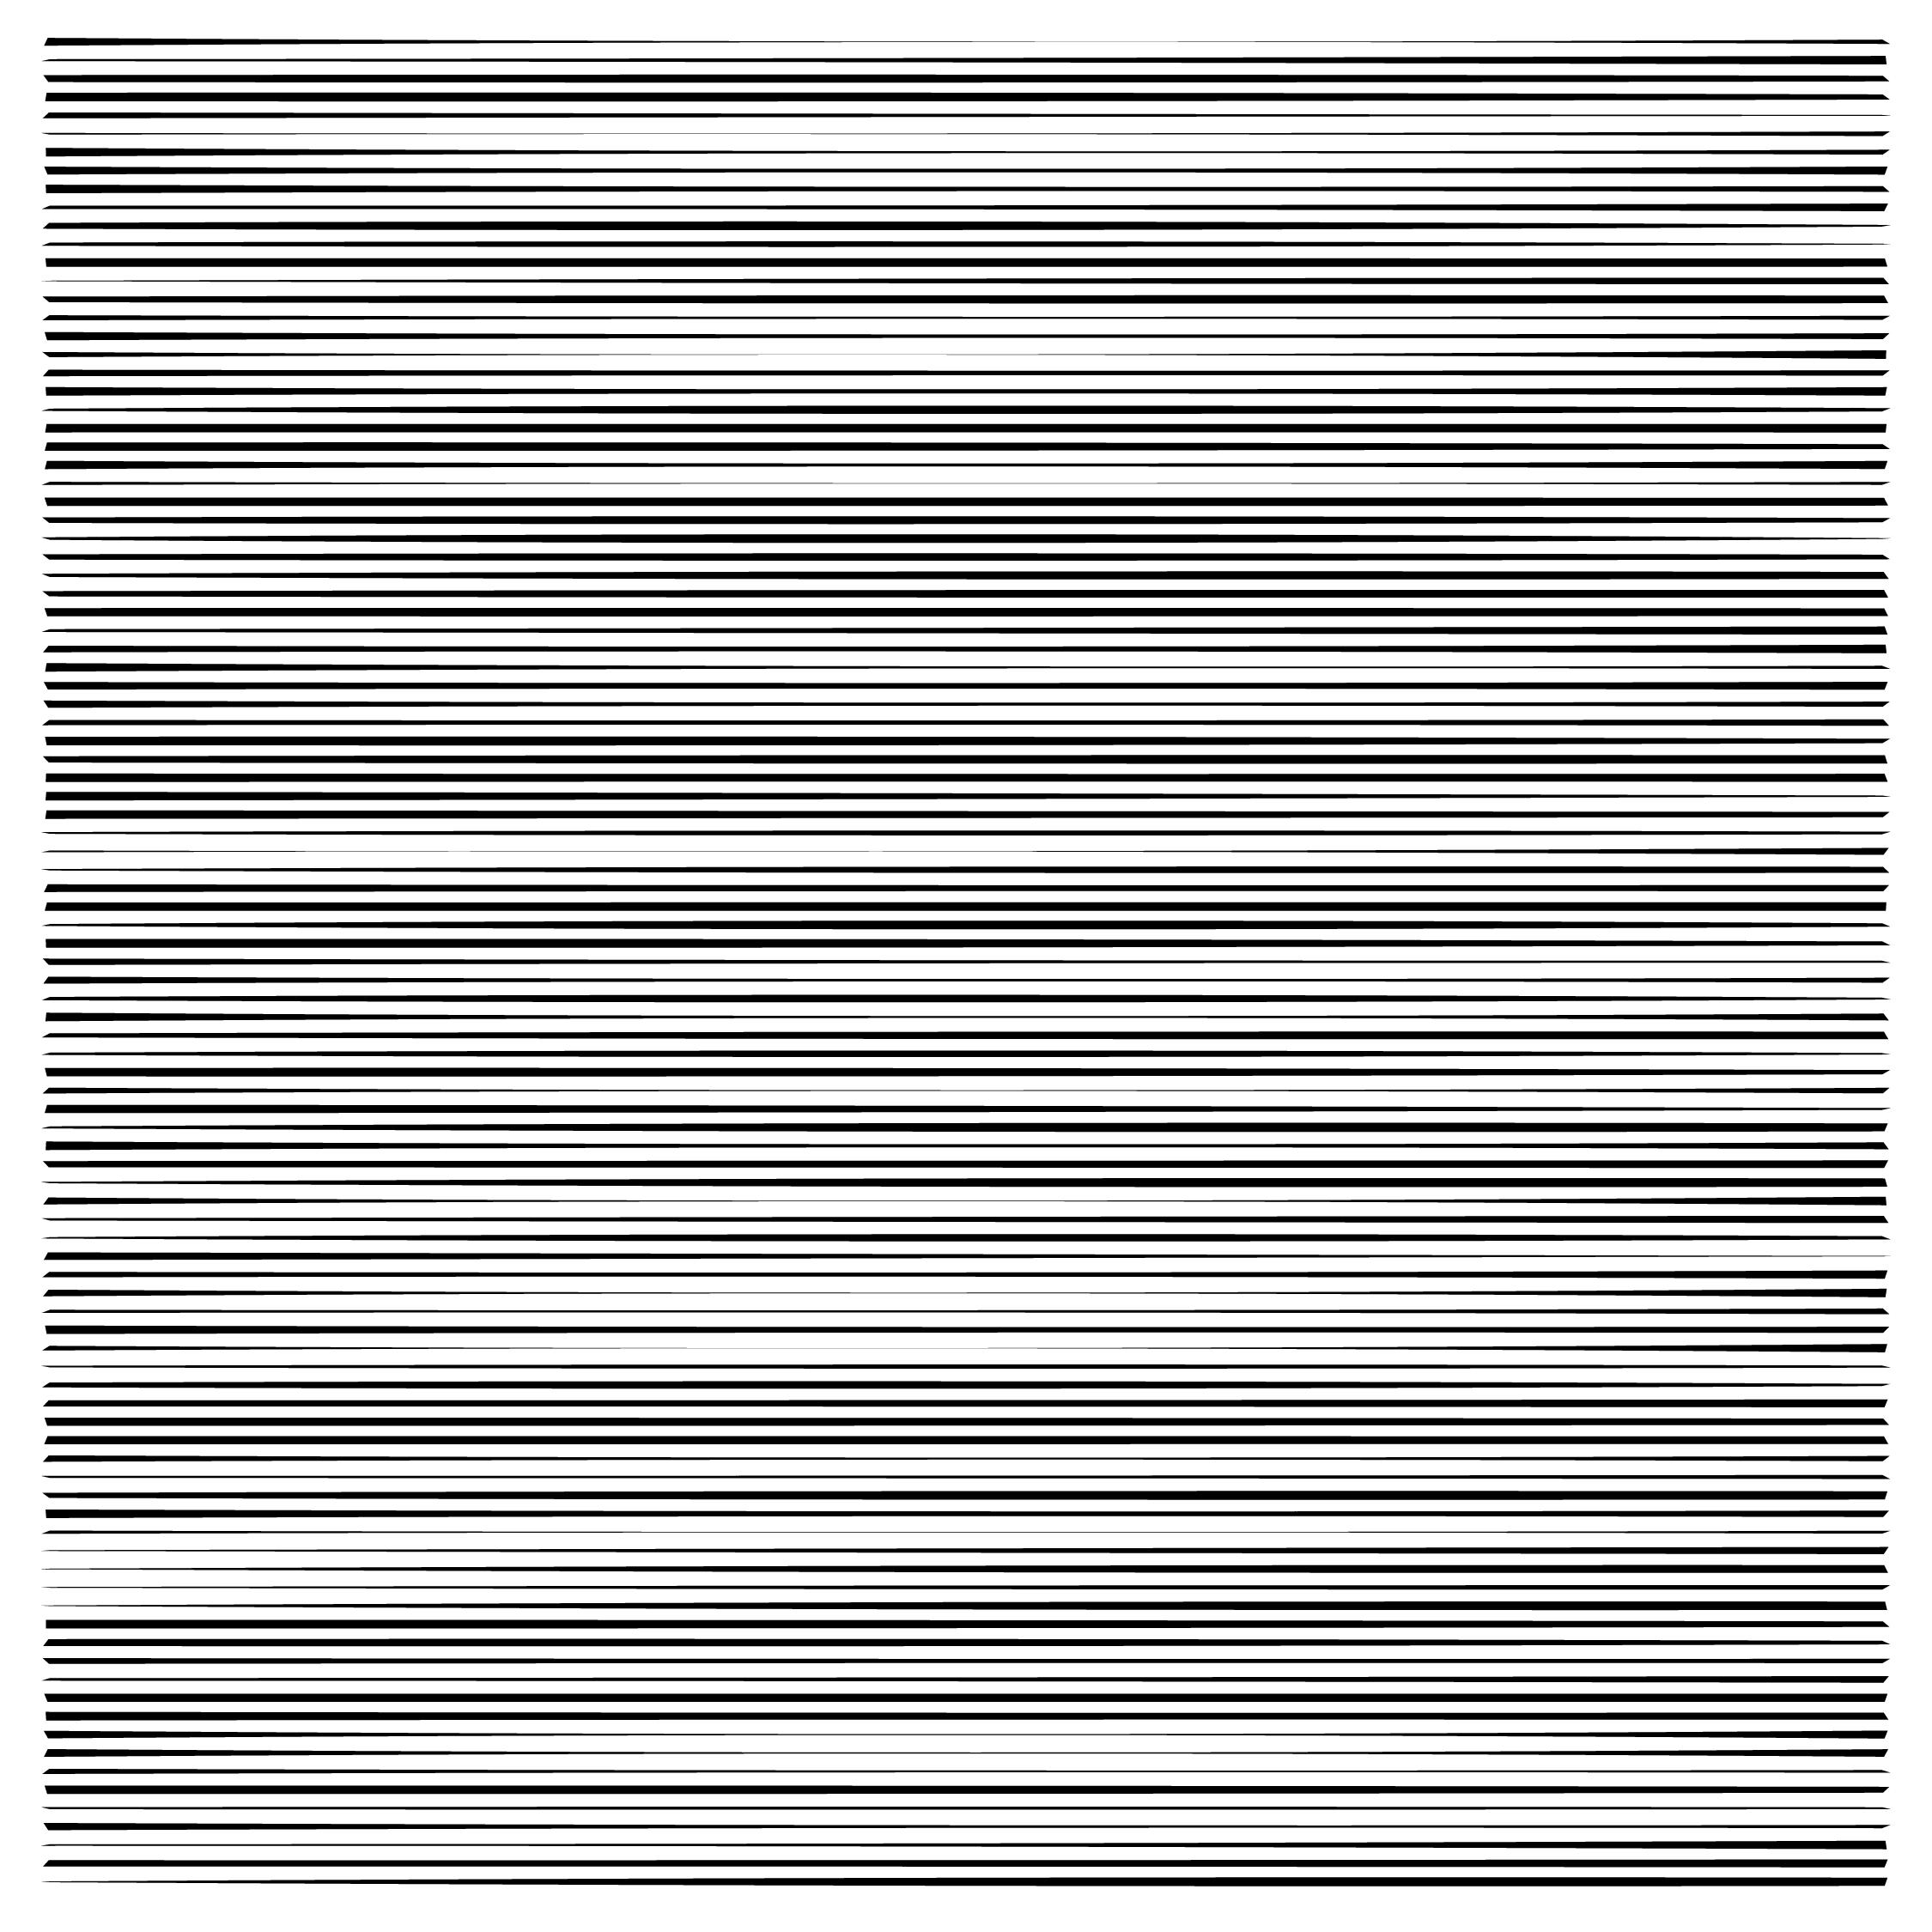 wlines-05.jpg